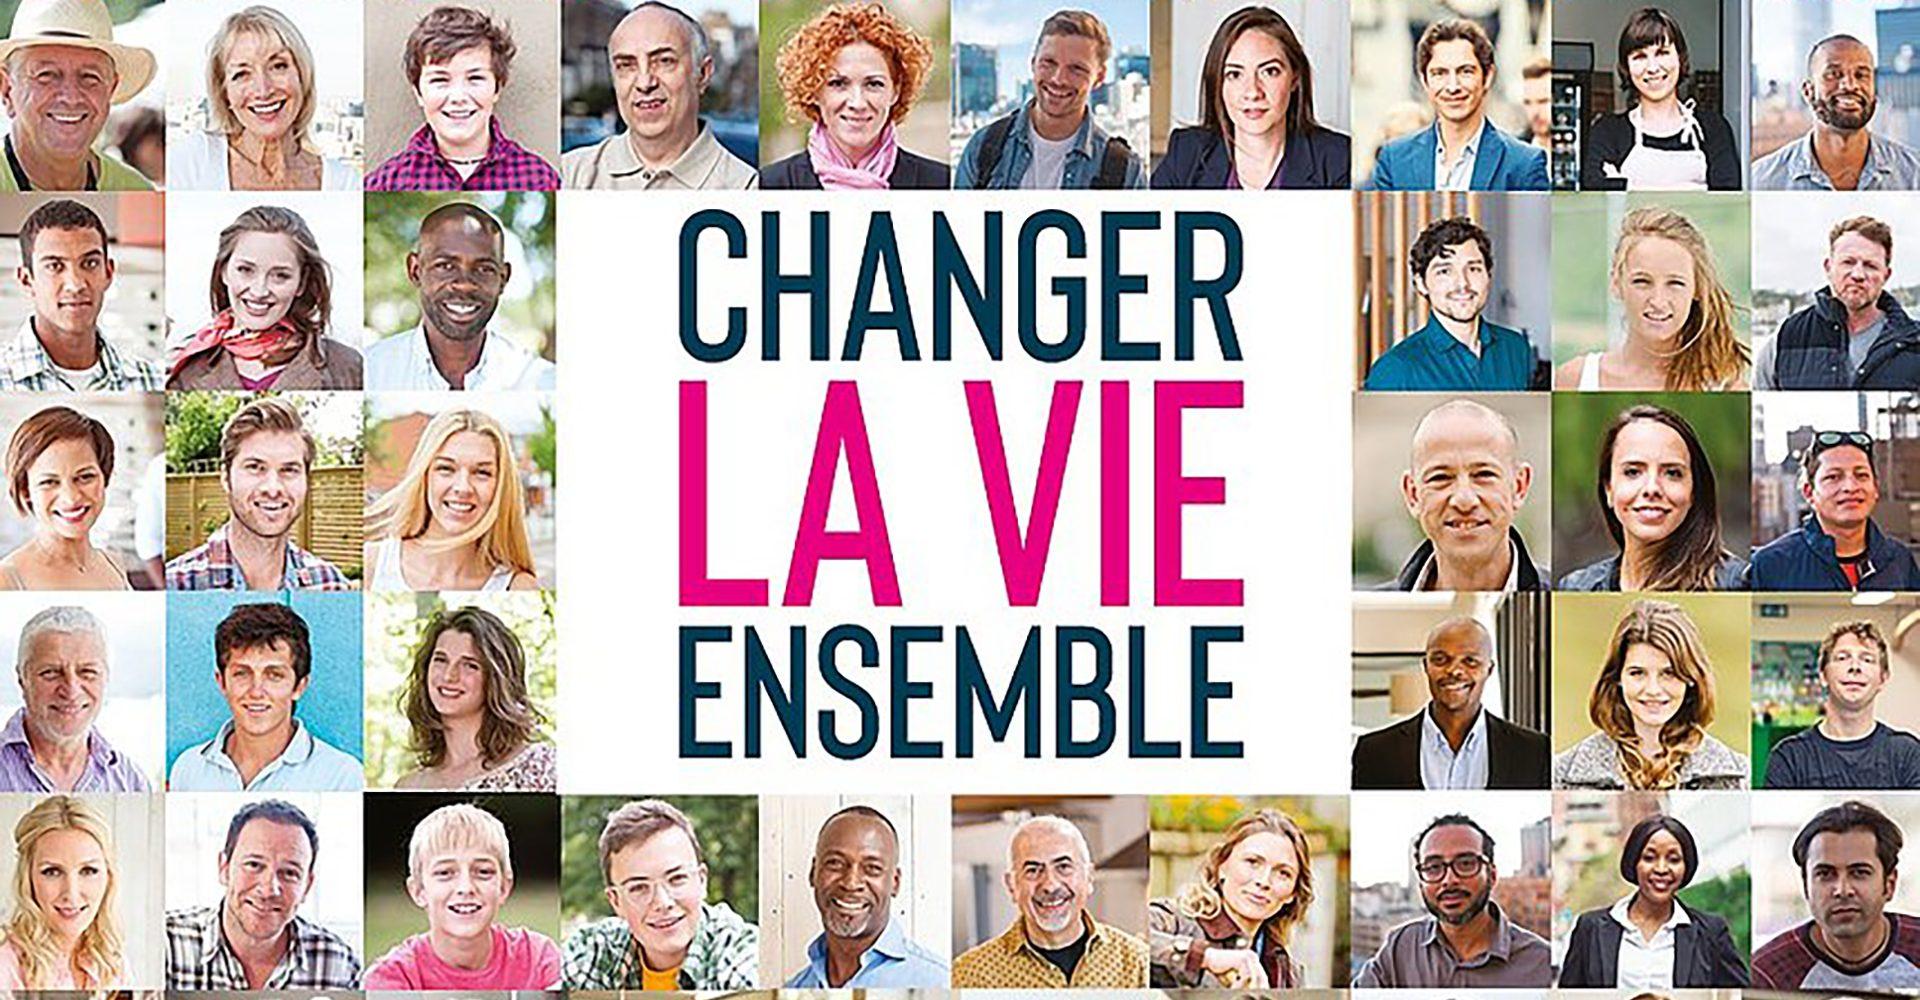 Changer la ville ensemble